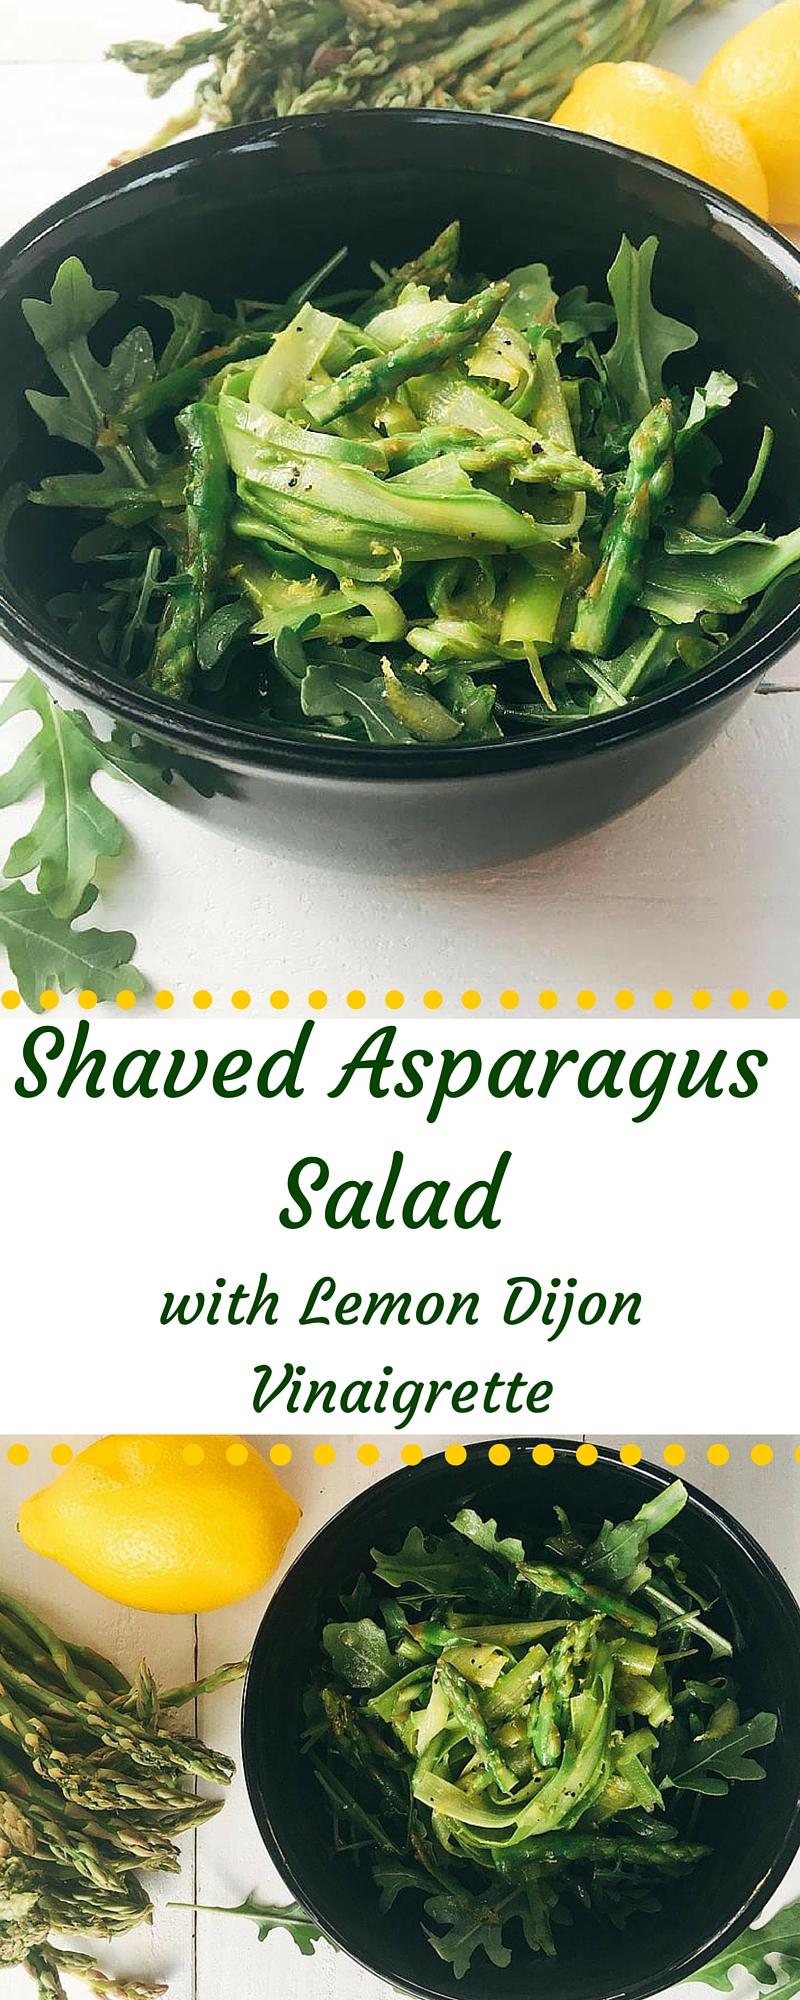 Shaved Asparagus Salad with Lemon Dijon Vinaigrette | Three Olives ...